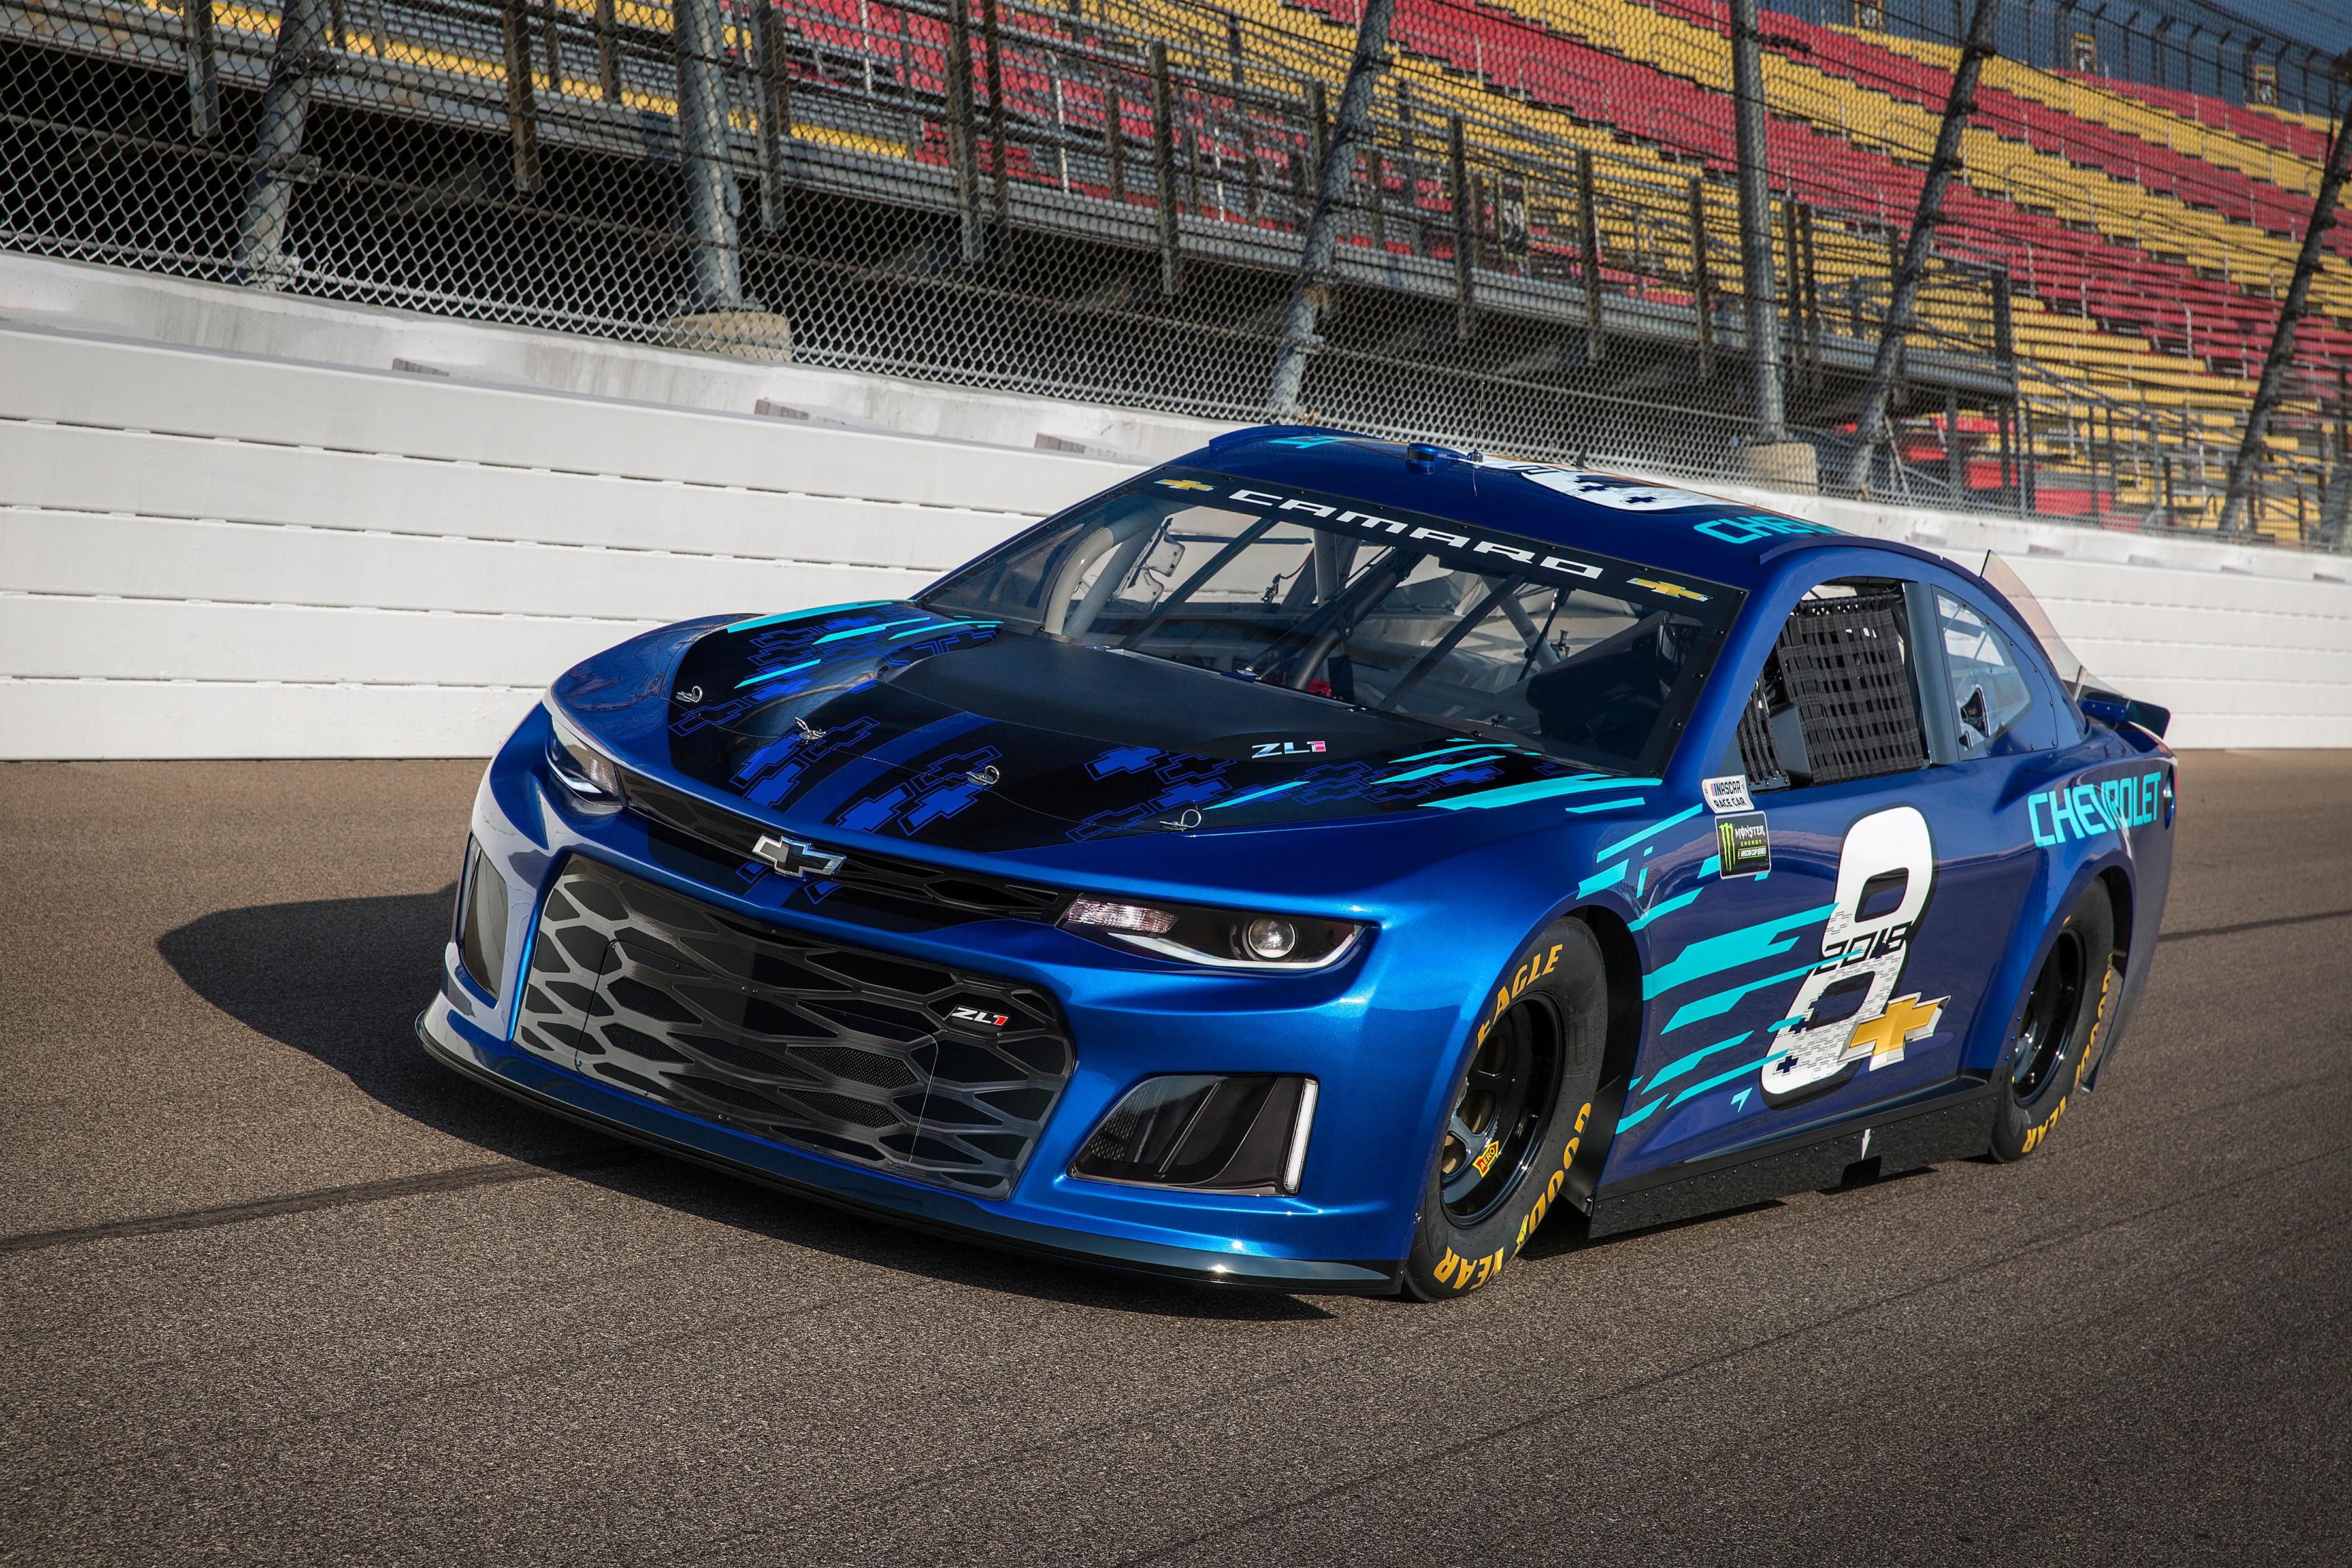 2018 Chevrolet Camaro ZL1 NASCAR Cup